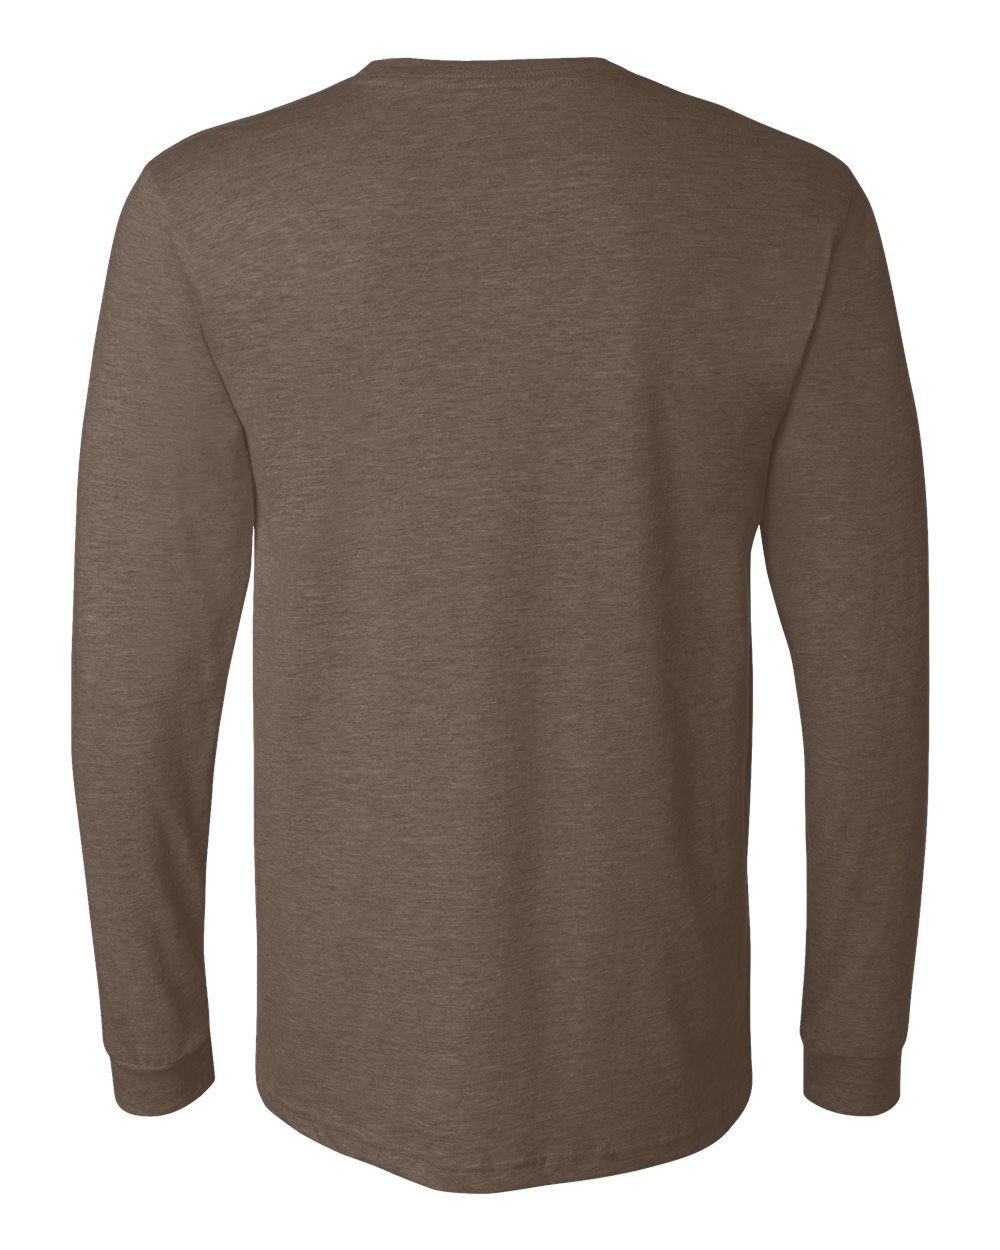 Bella-Canvas-Mens-Blank-Top-Long-Sleeve-Jersey-Tee-T-Shirt-3501-up-to-3XL thumbnail 53